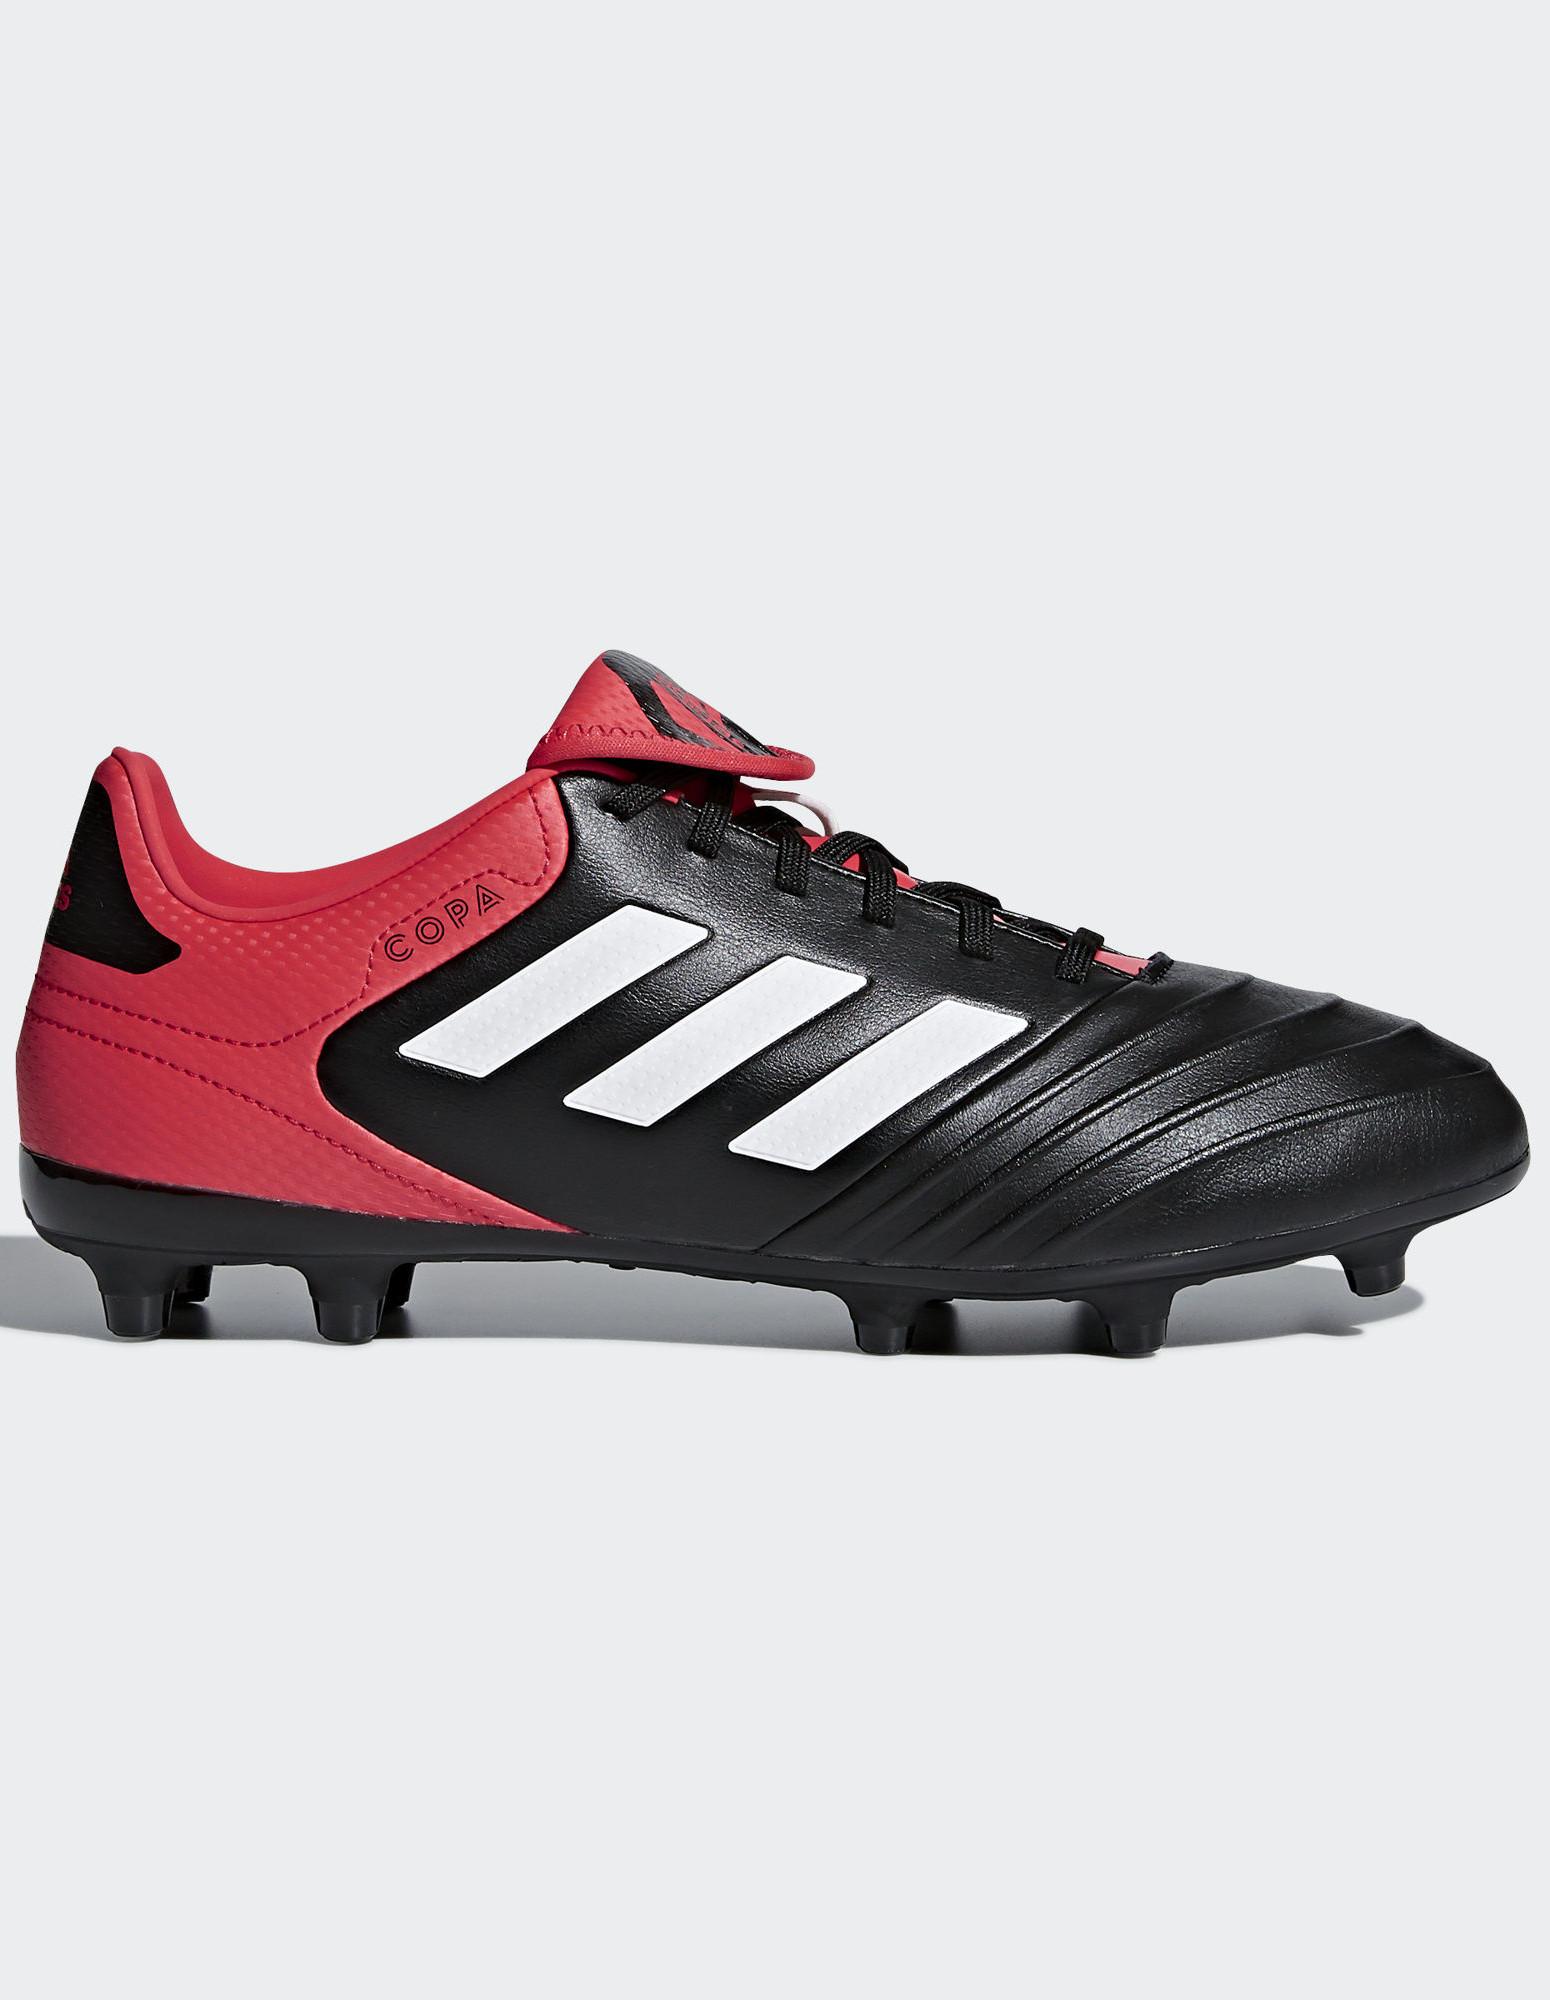 Football shoes Adidas Scarpe Calcio Copa 18.3 FG Mundial Nero Vera ... 262cde099a2